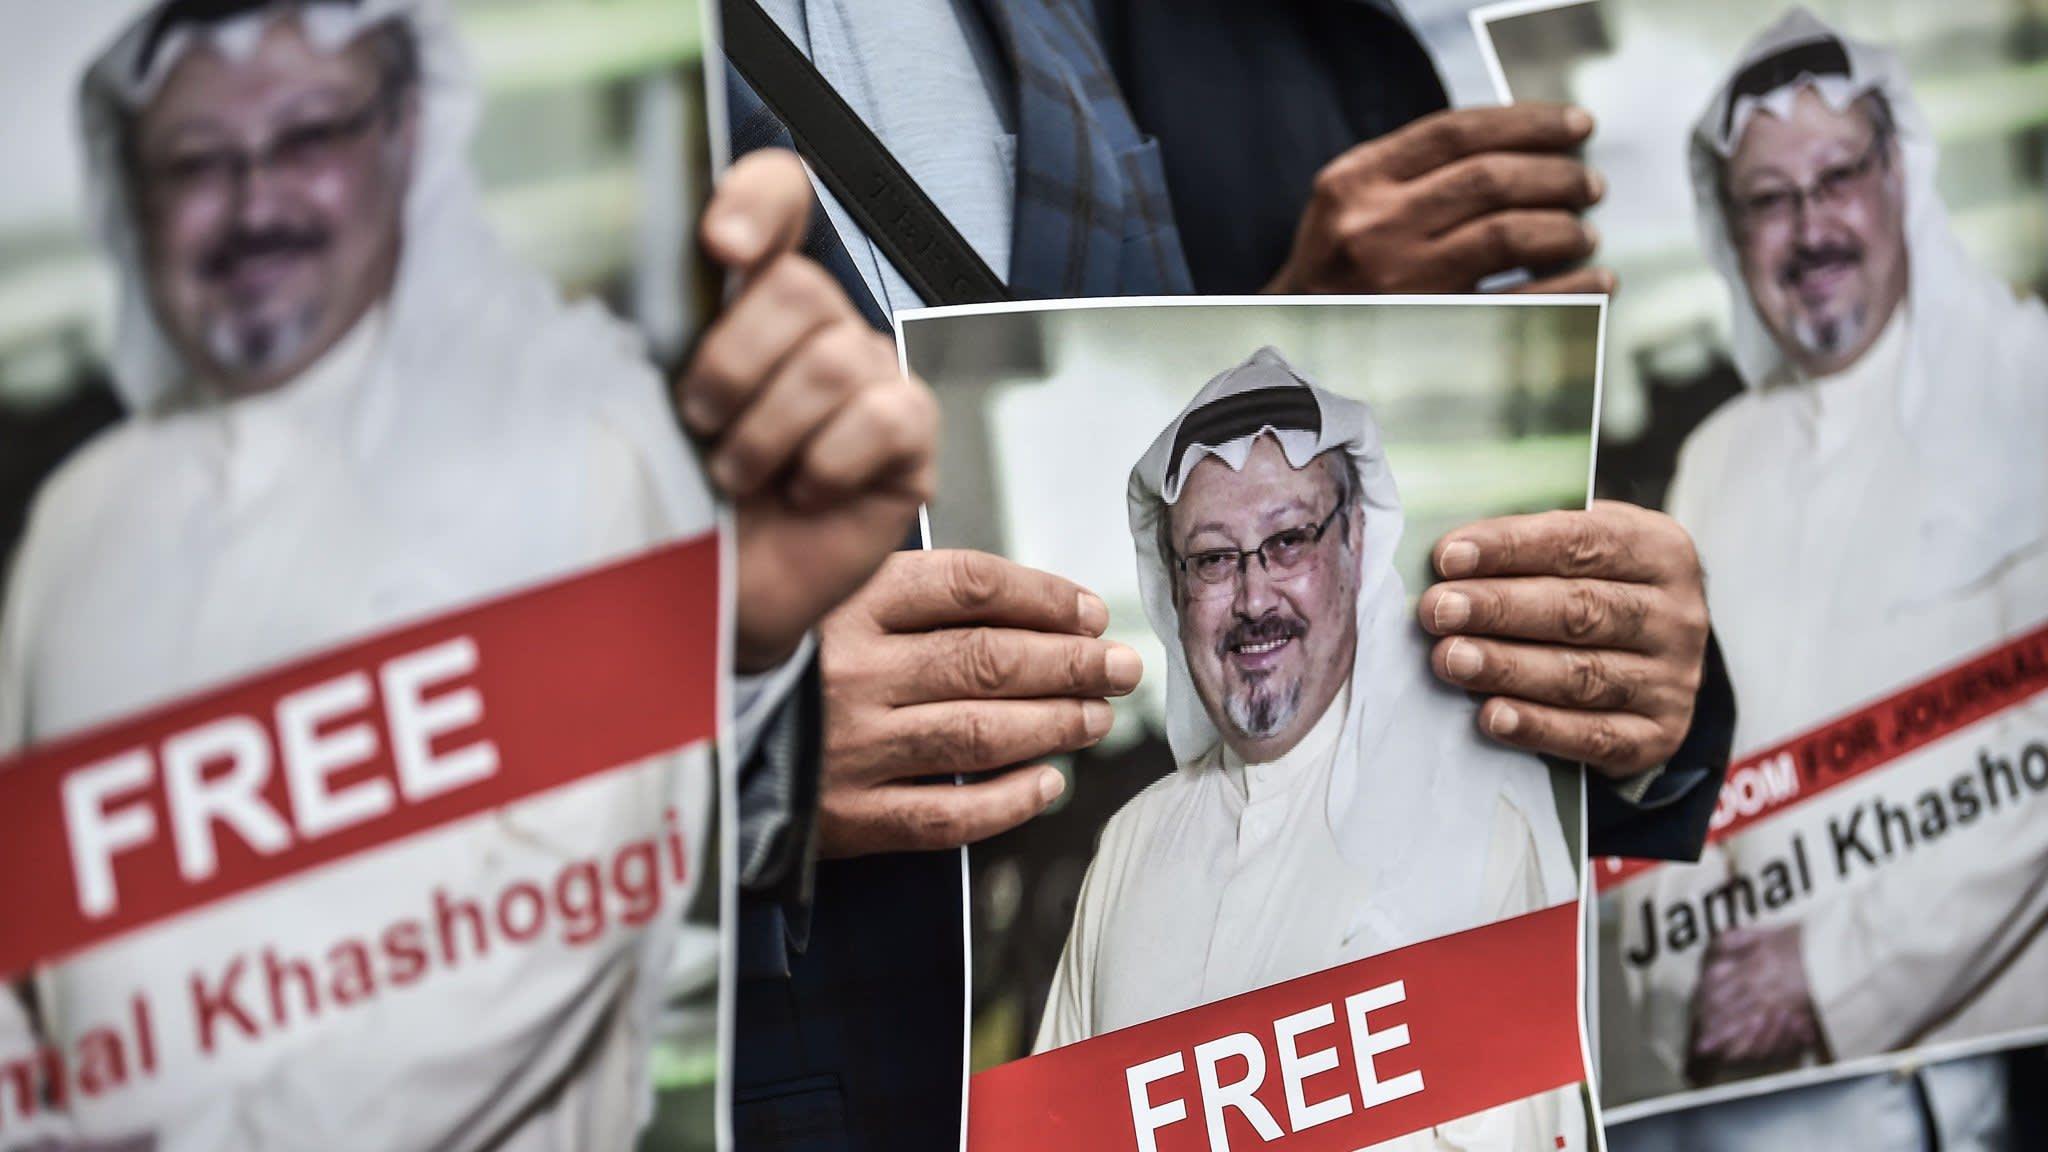 Khashoggi case prompts executives to rethink Saudi roles